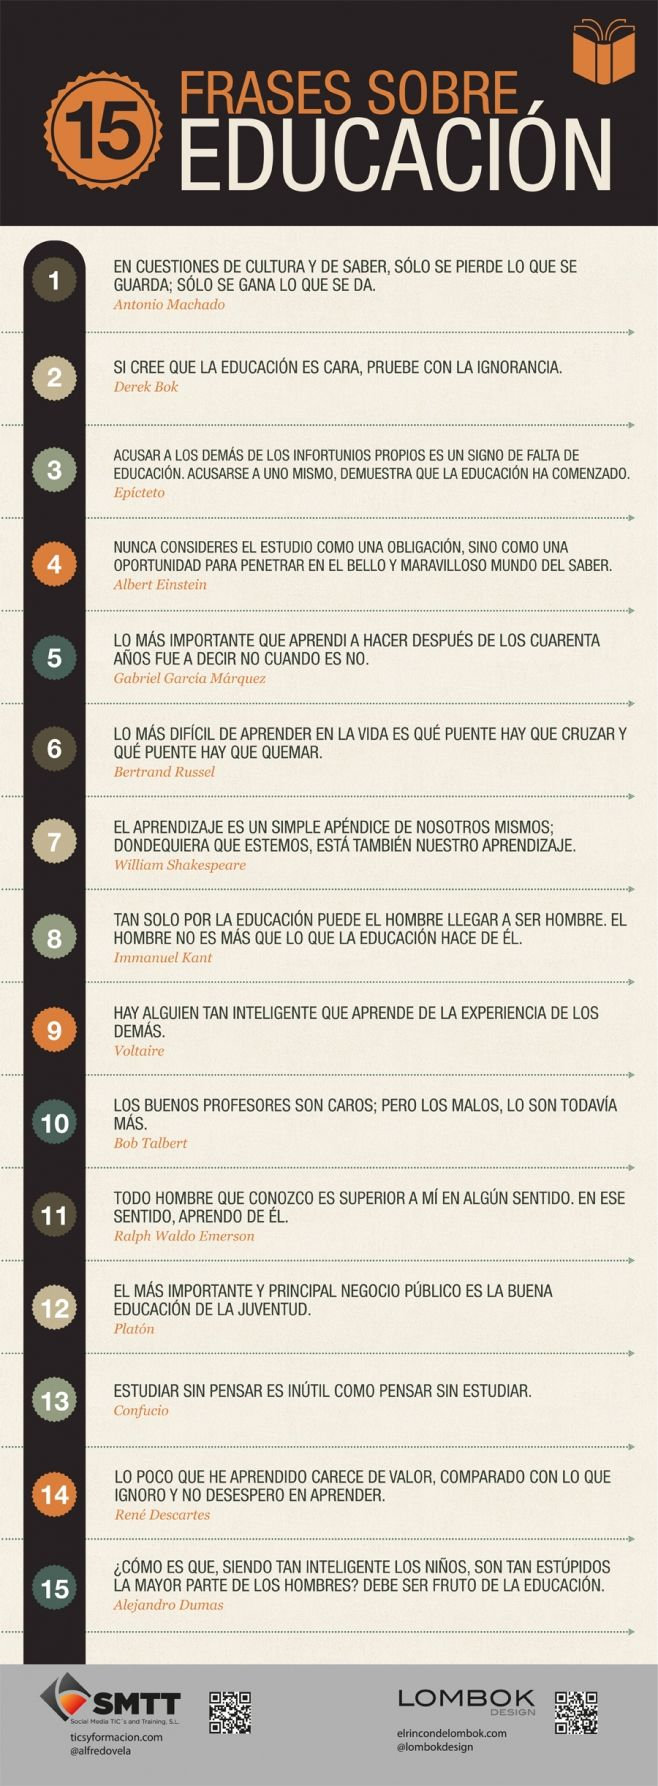 Educandome: 10 frases sobre educacion #profescampuseros @penillagarcia @emilsegundo #tweetdesdemissueños